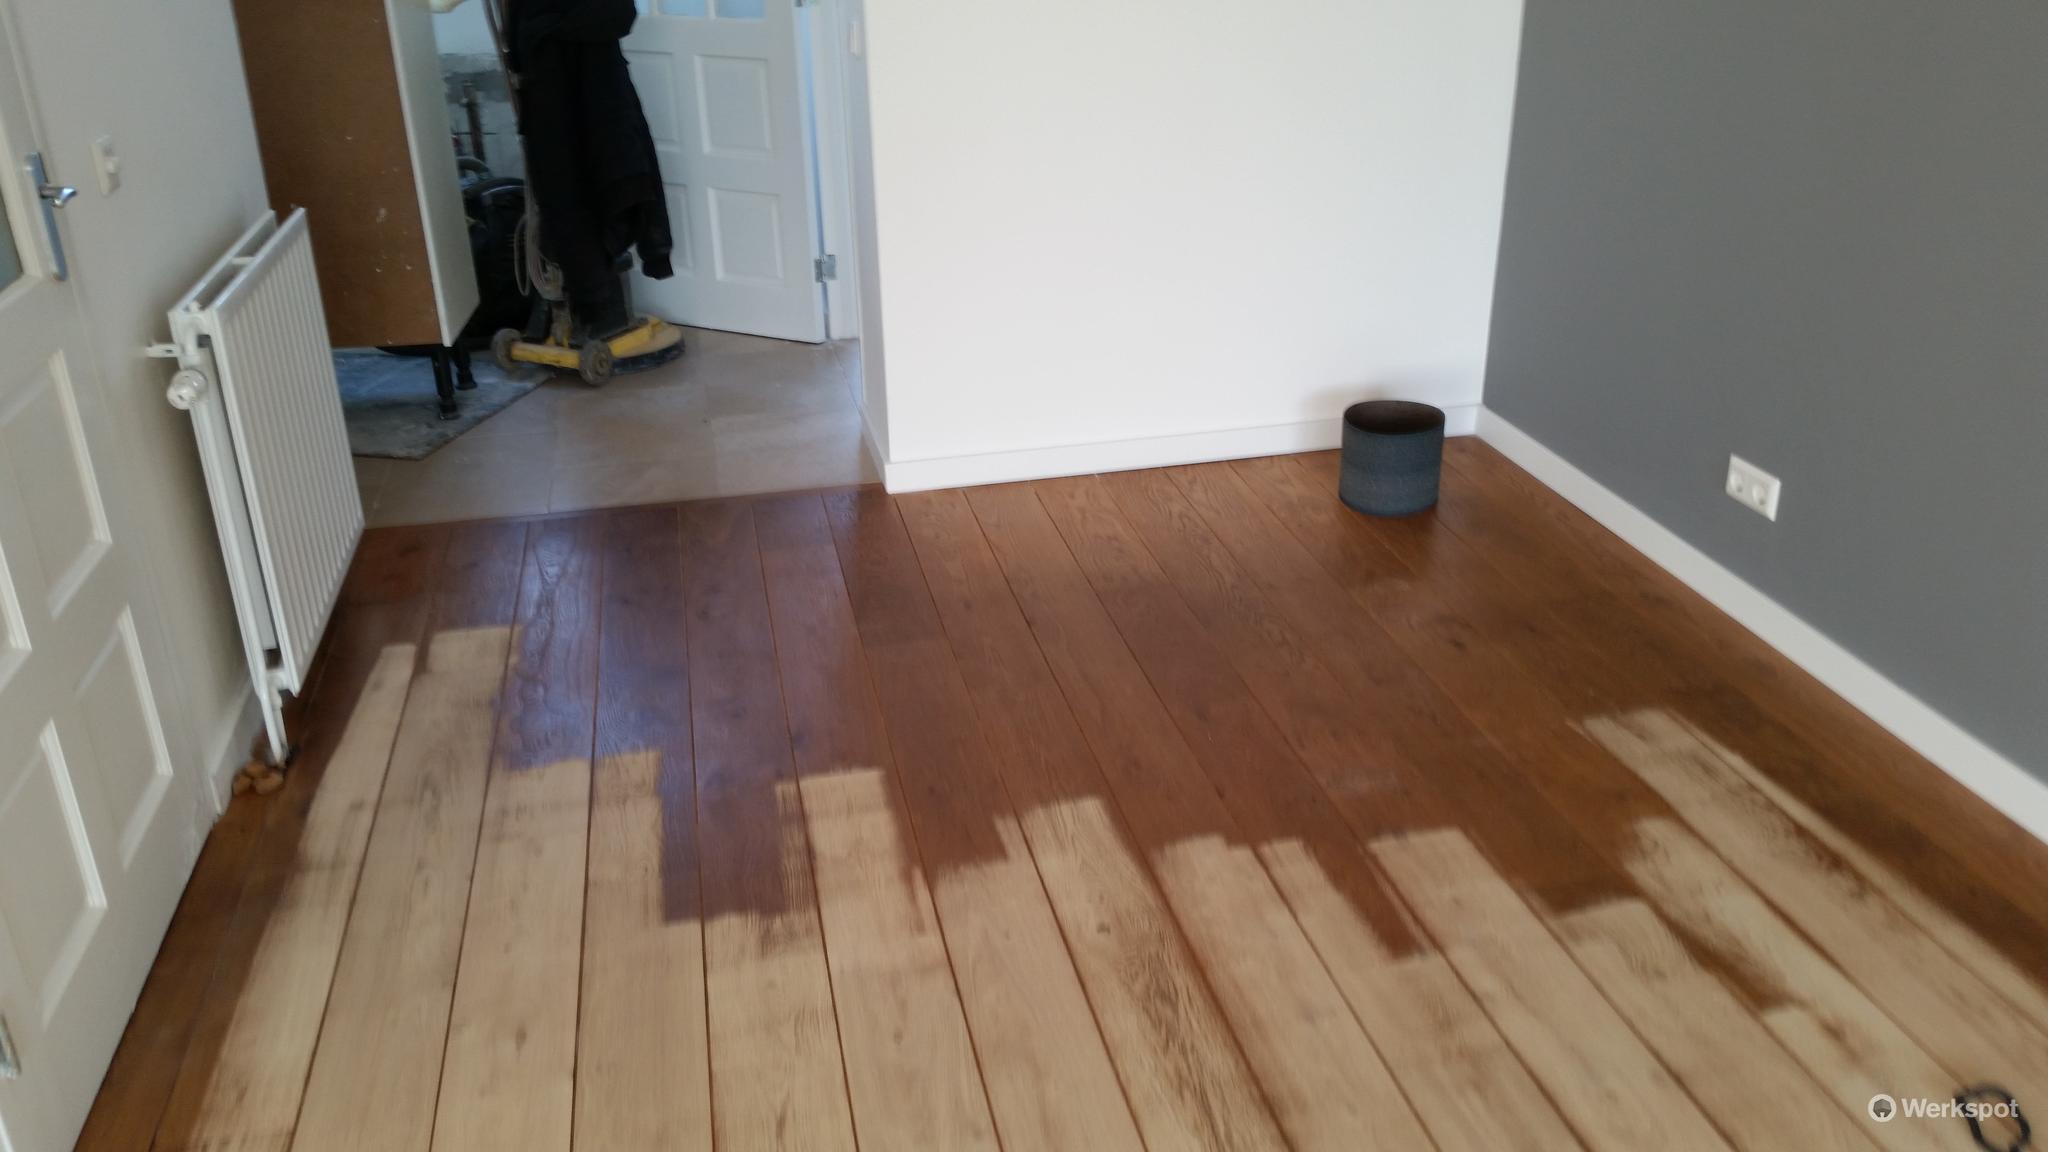 Grenen vloeren schuren grenen vloer lakken grenen vloer grey wash